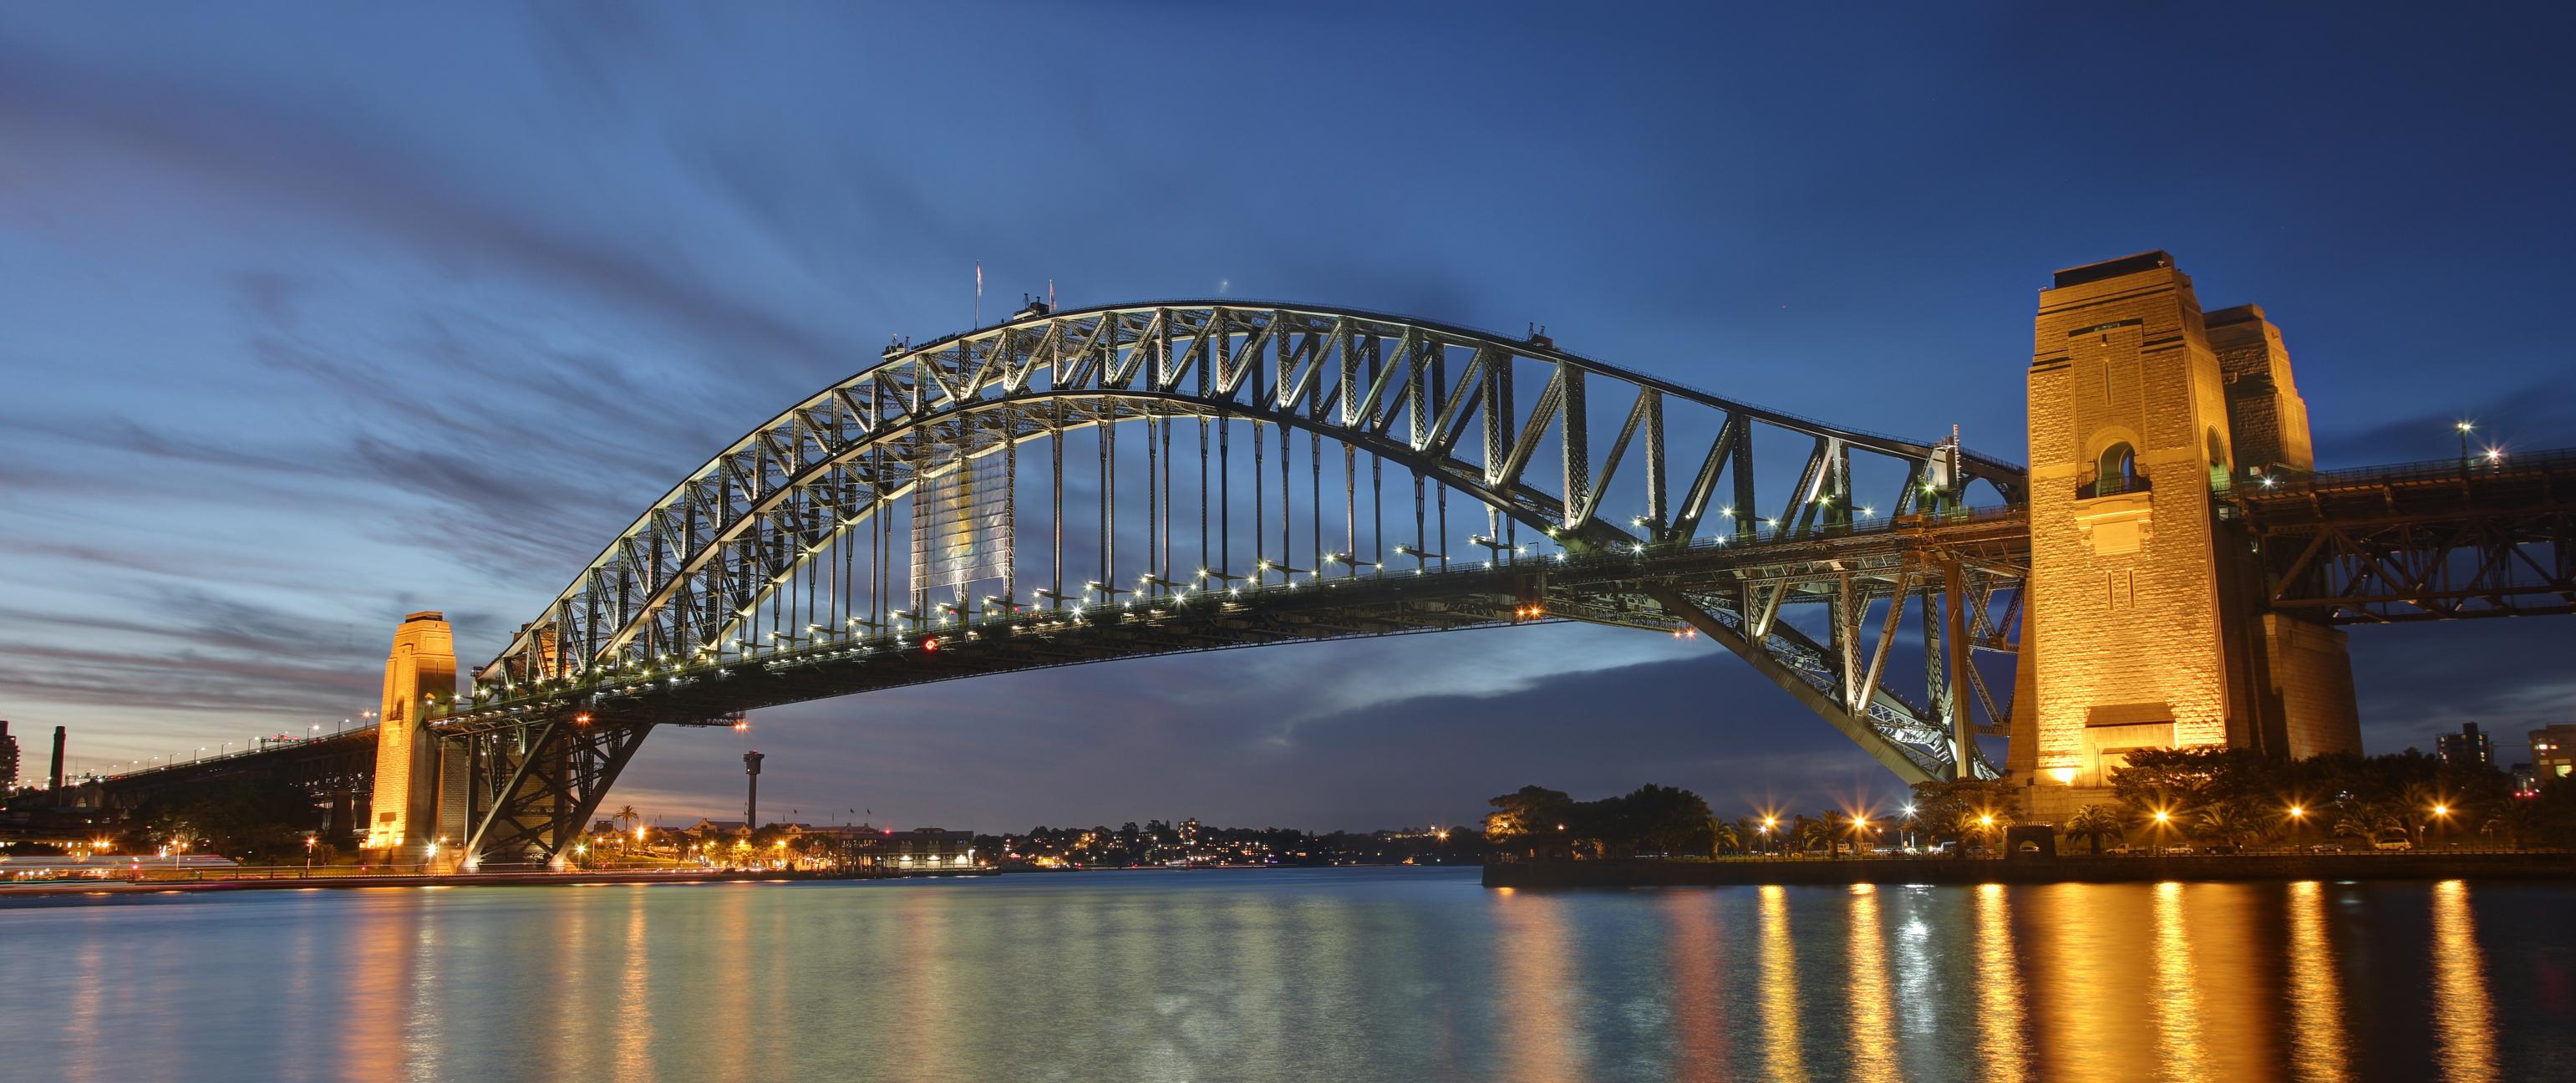 Sydney Harbour Bridge High Quality Background on Wallpapers Vista